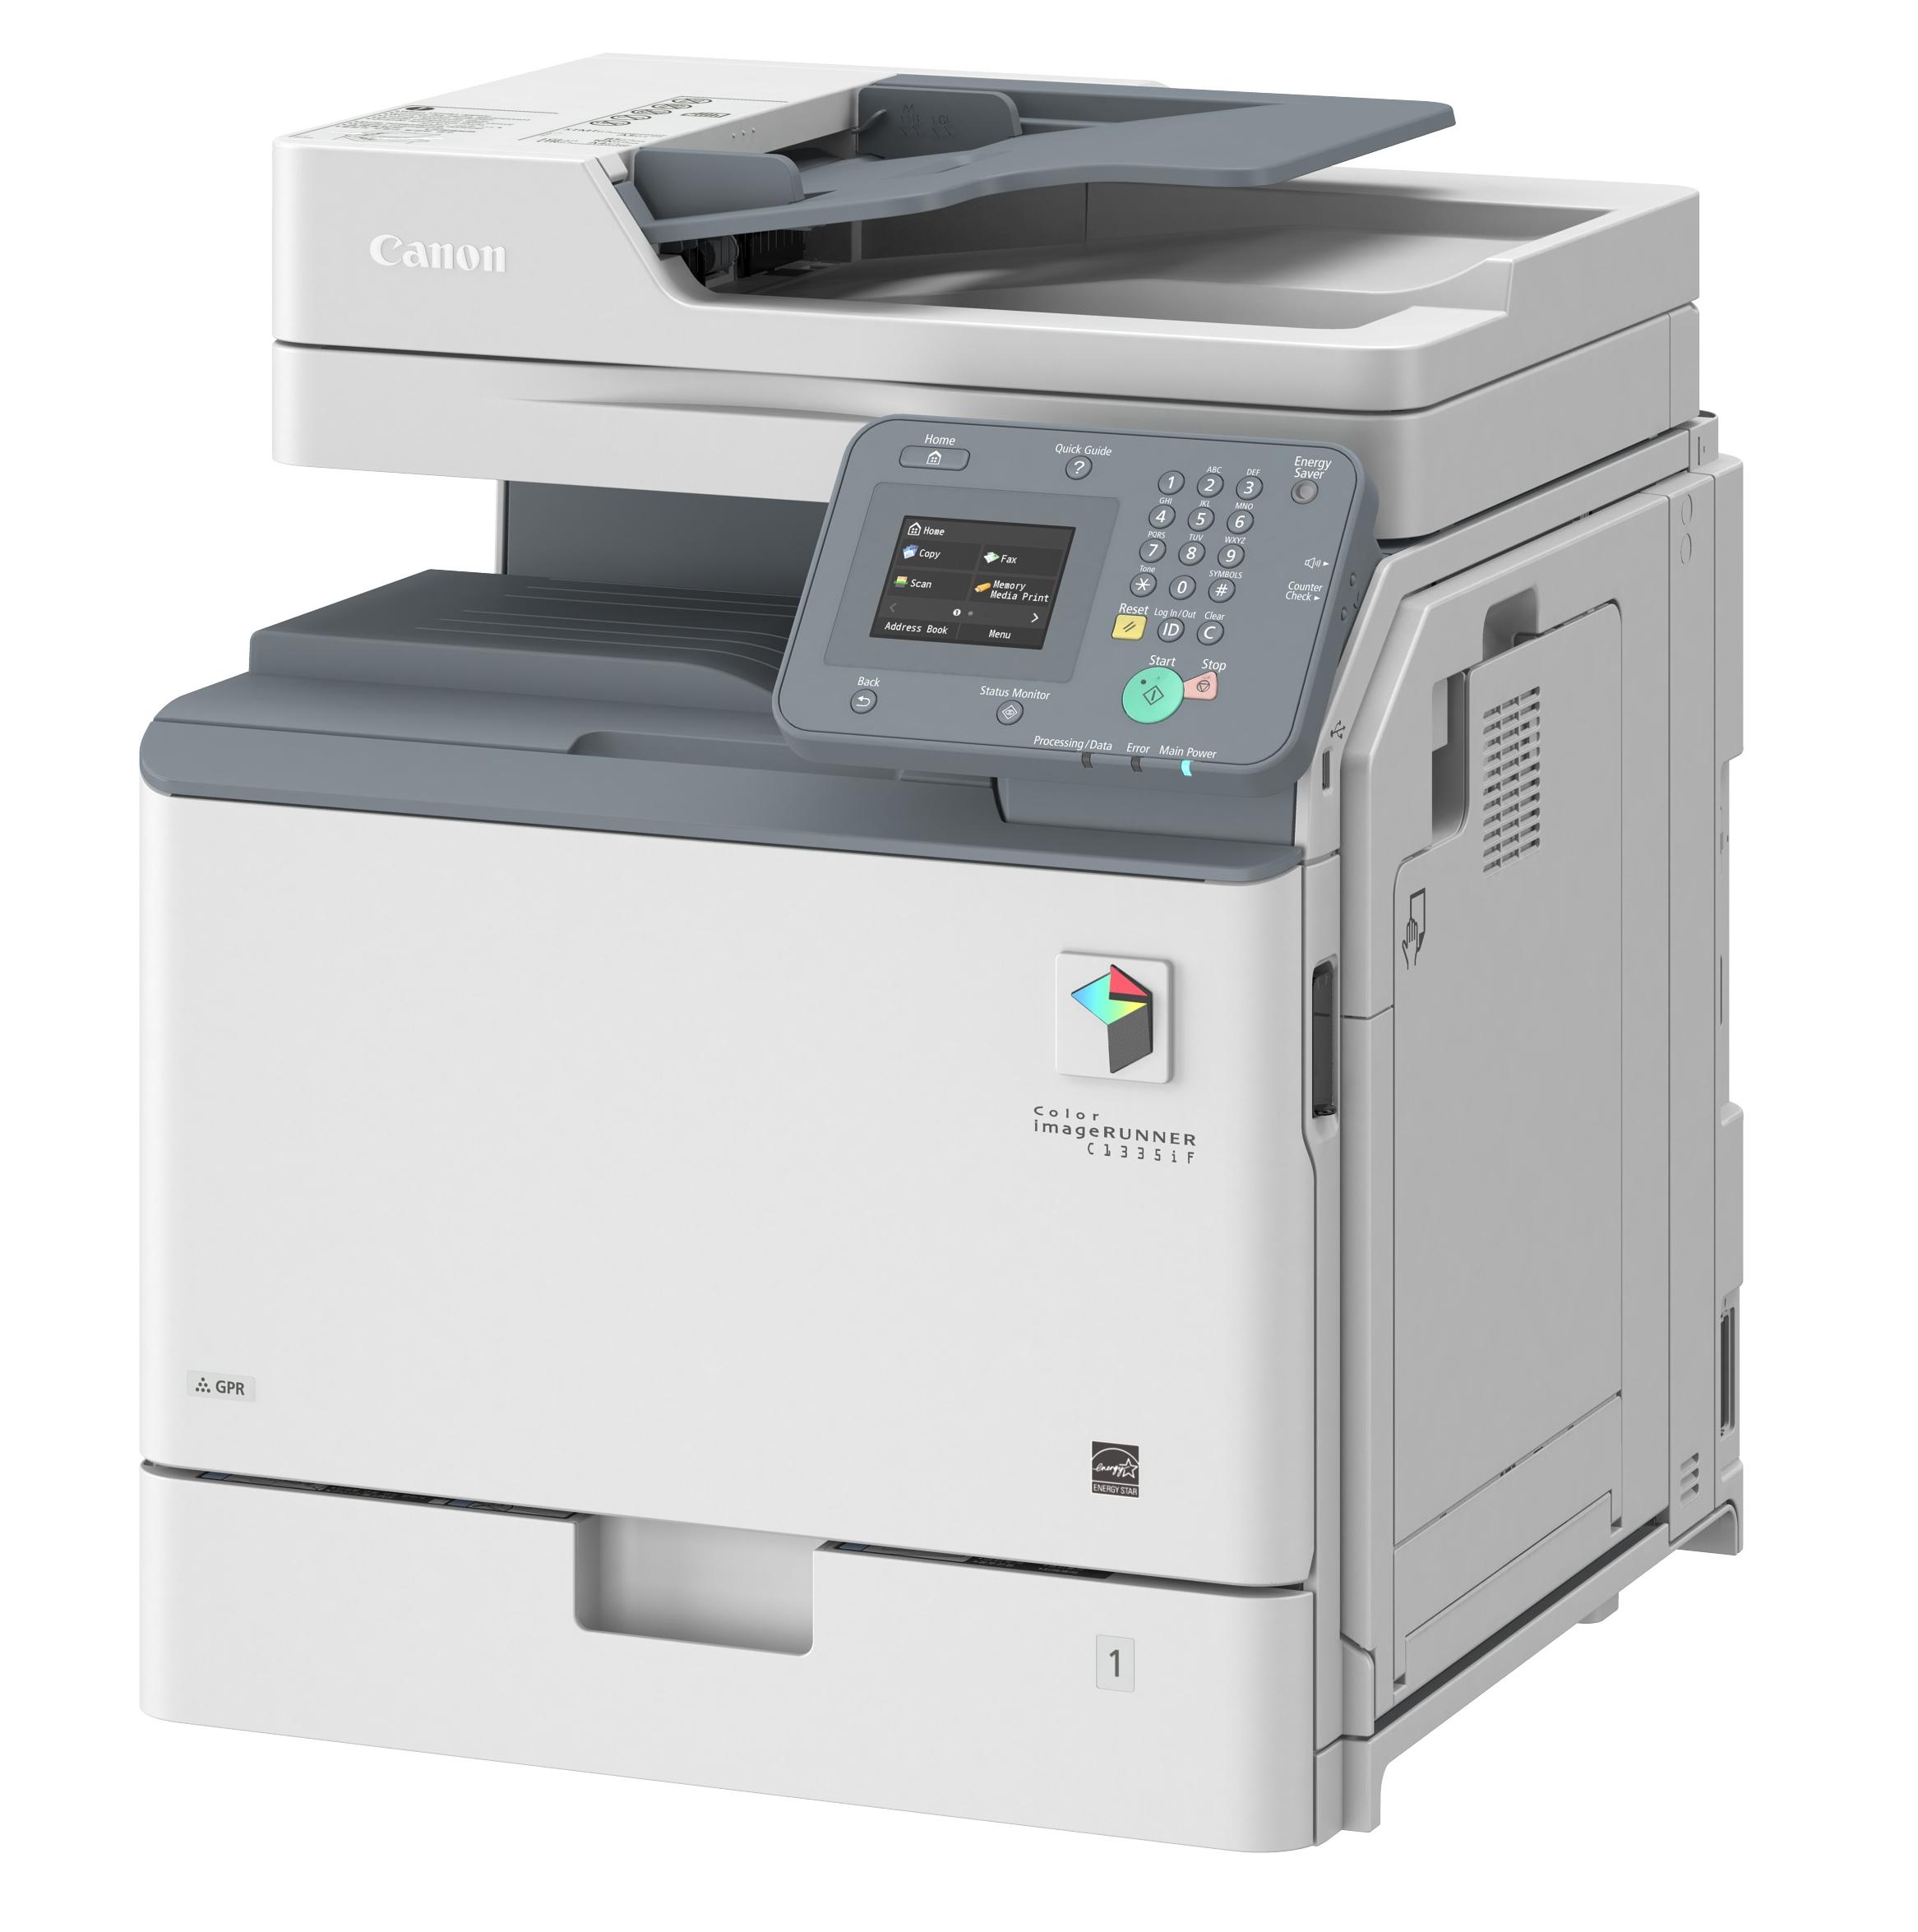 CANON - ImageRUNNER Color C1300iSeries - Multifuncionales Color para Oficina Pequeña (SOHO)